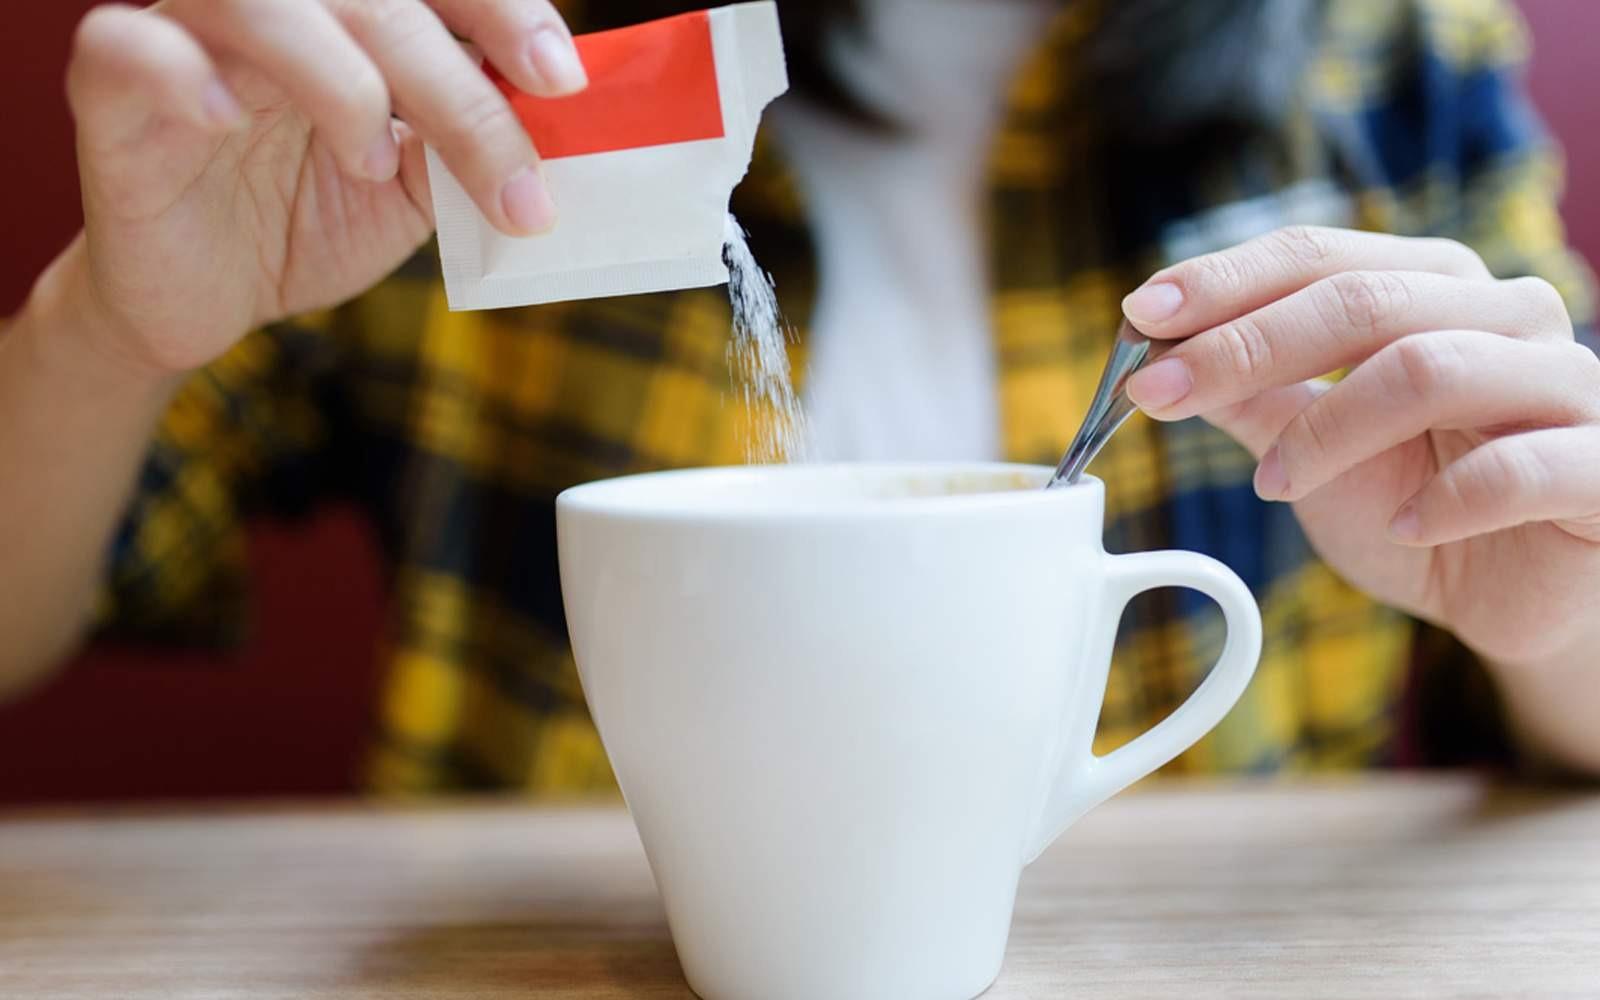 Normal Baru, Ini Manfaat Pemanis Sukralosa sebagai Pengganti Gula Diabetesi